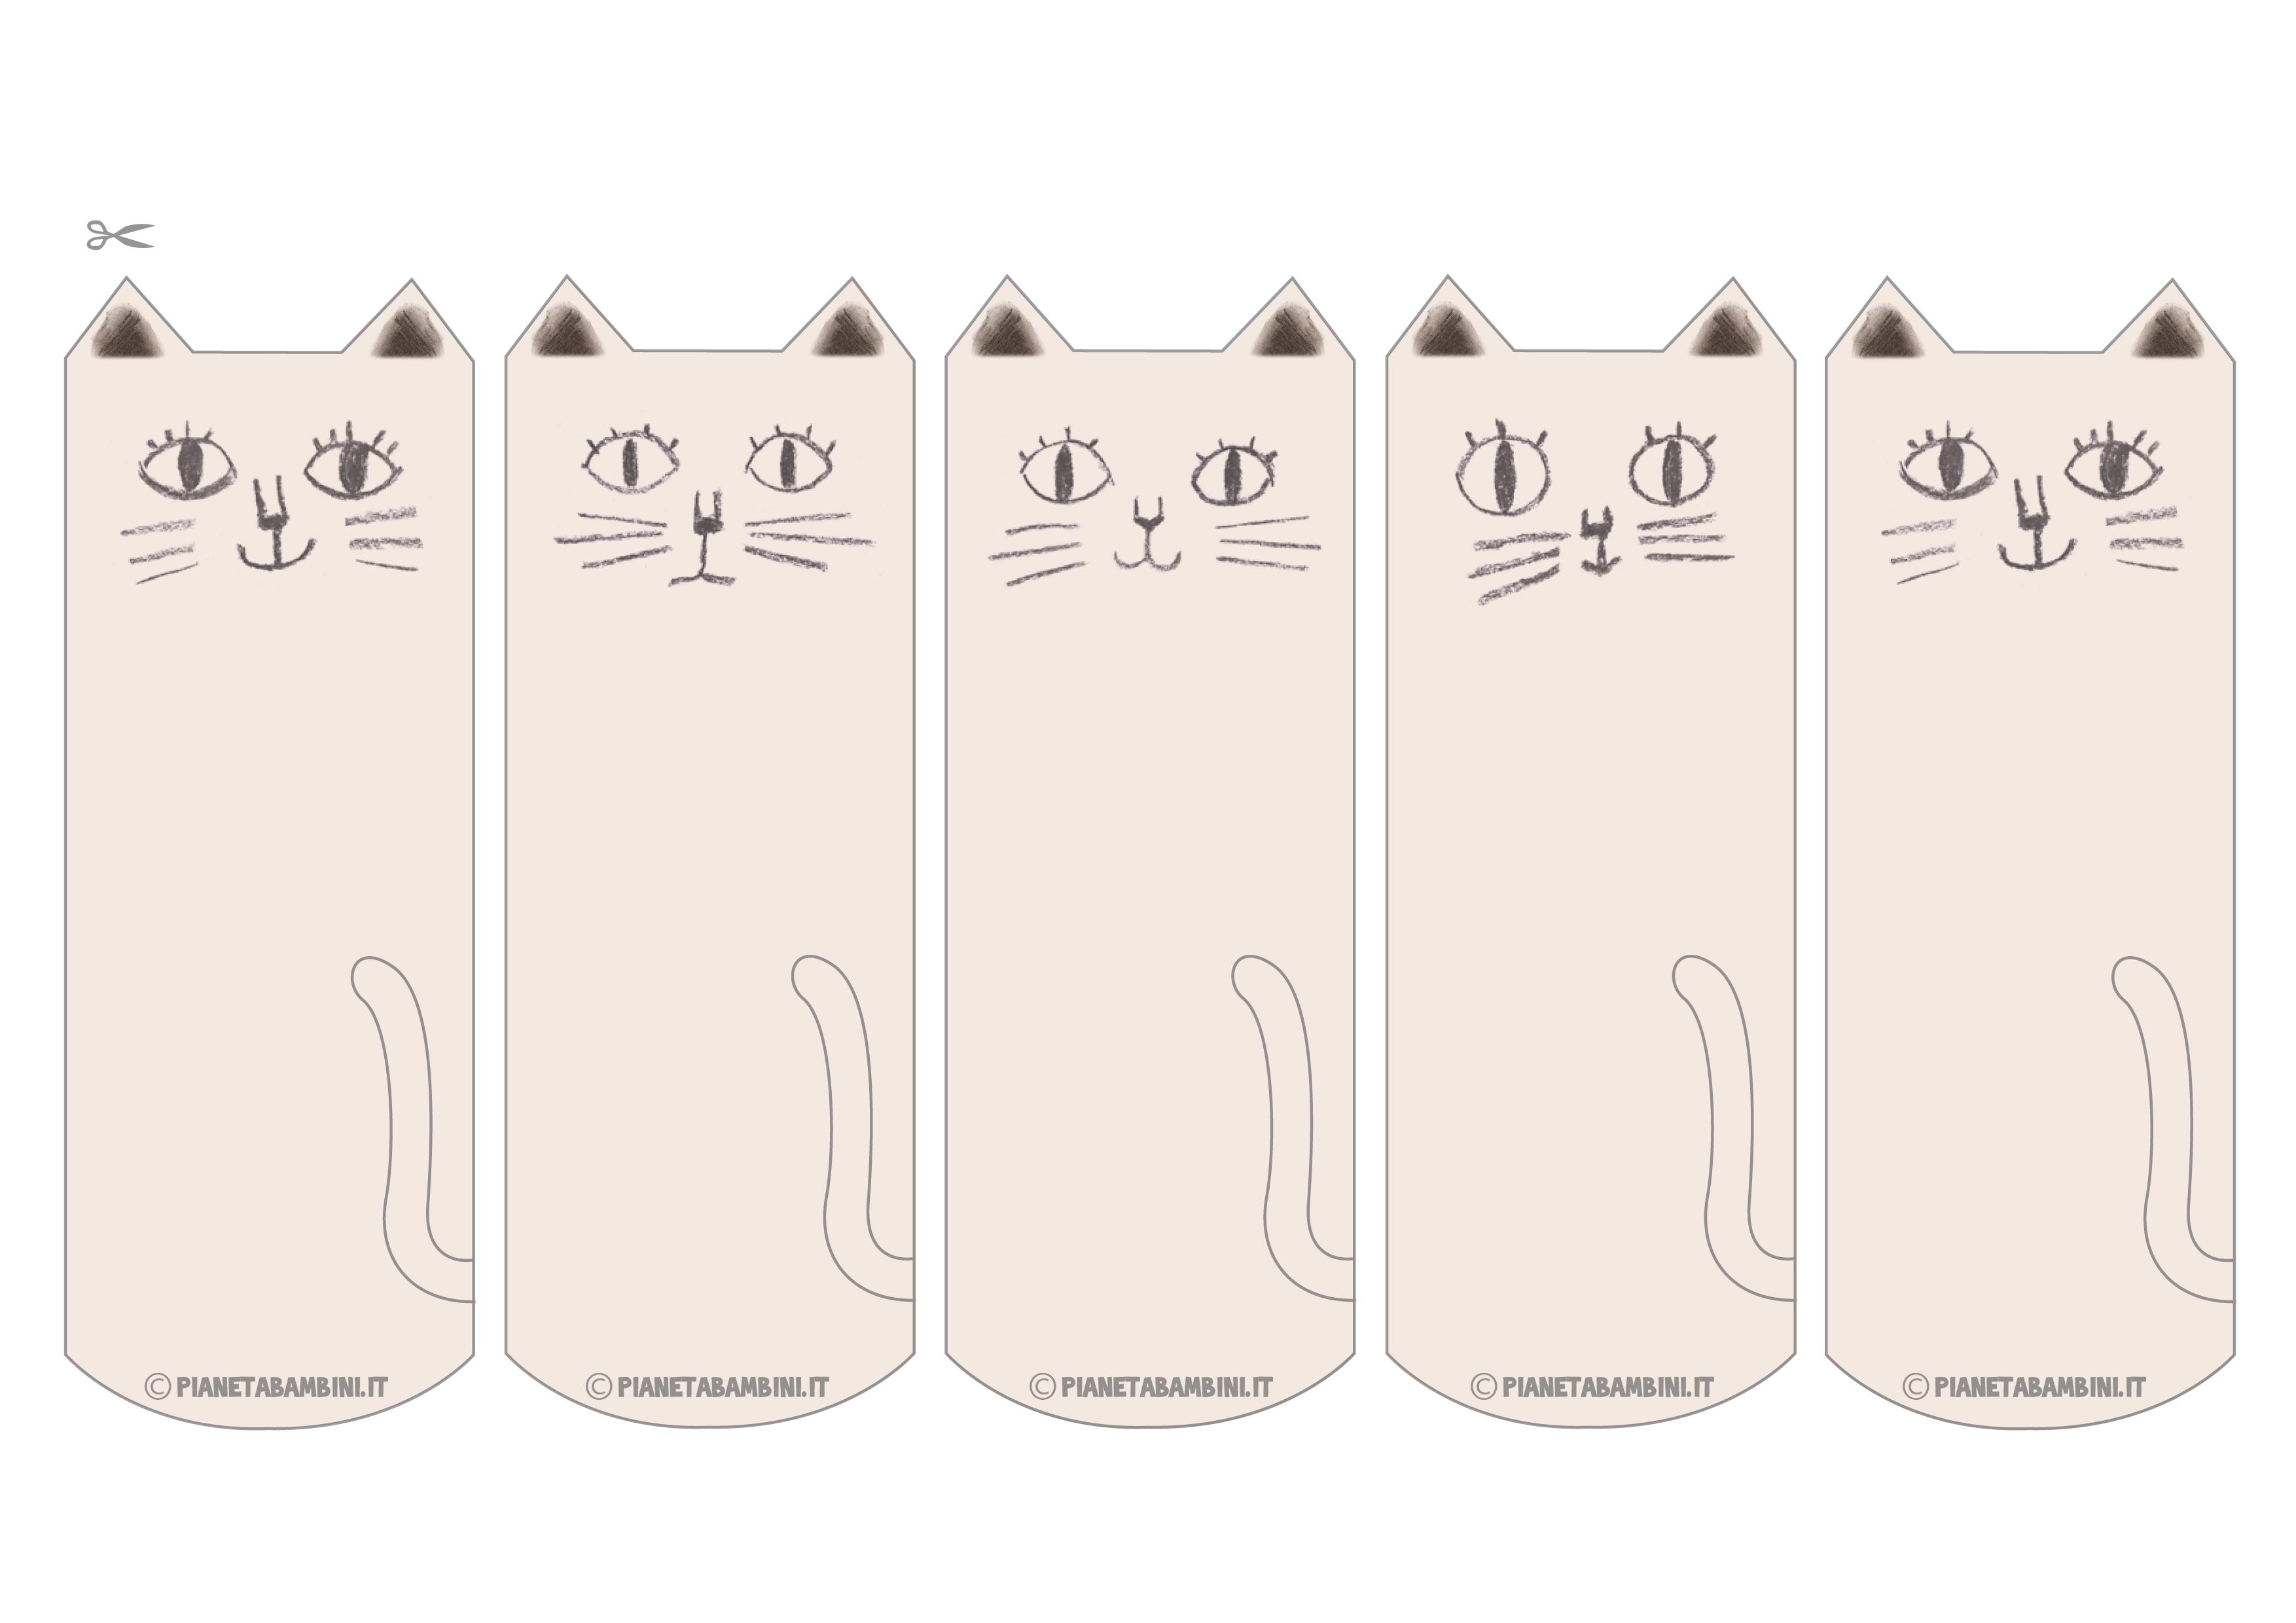 Segnalibri a forma di gatti già colorati